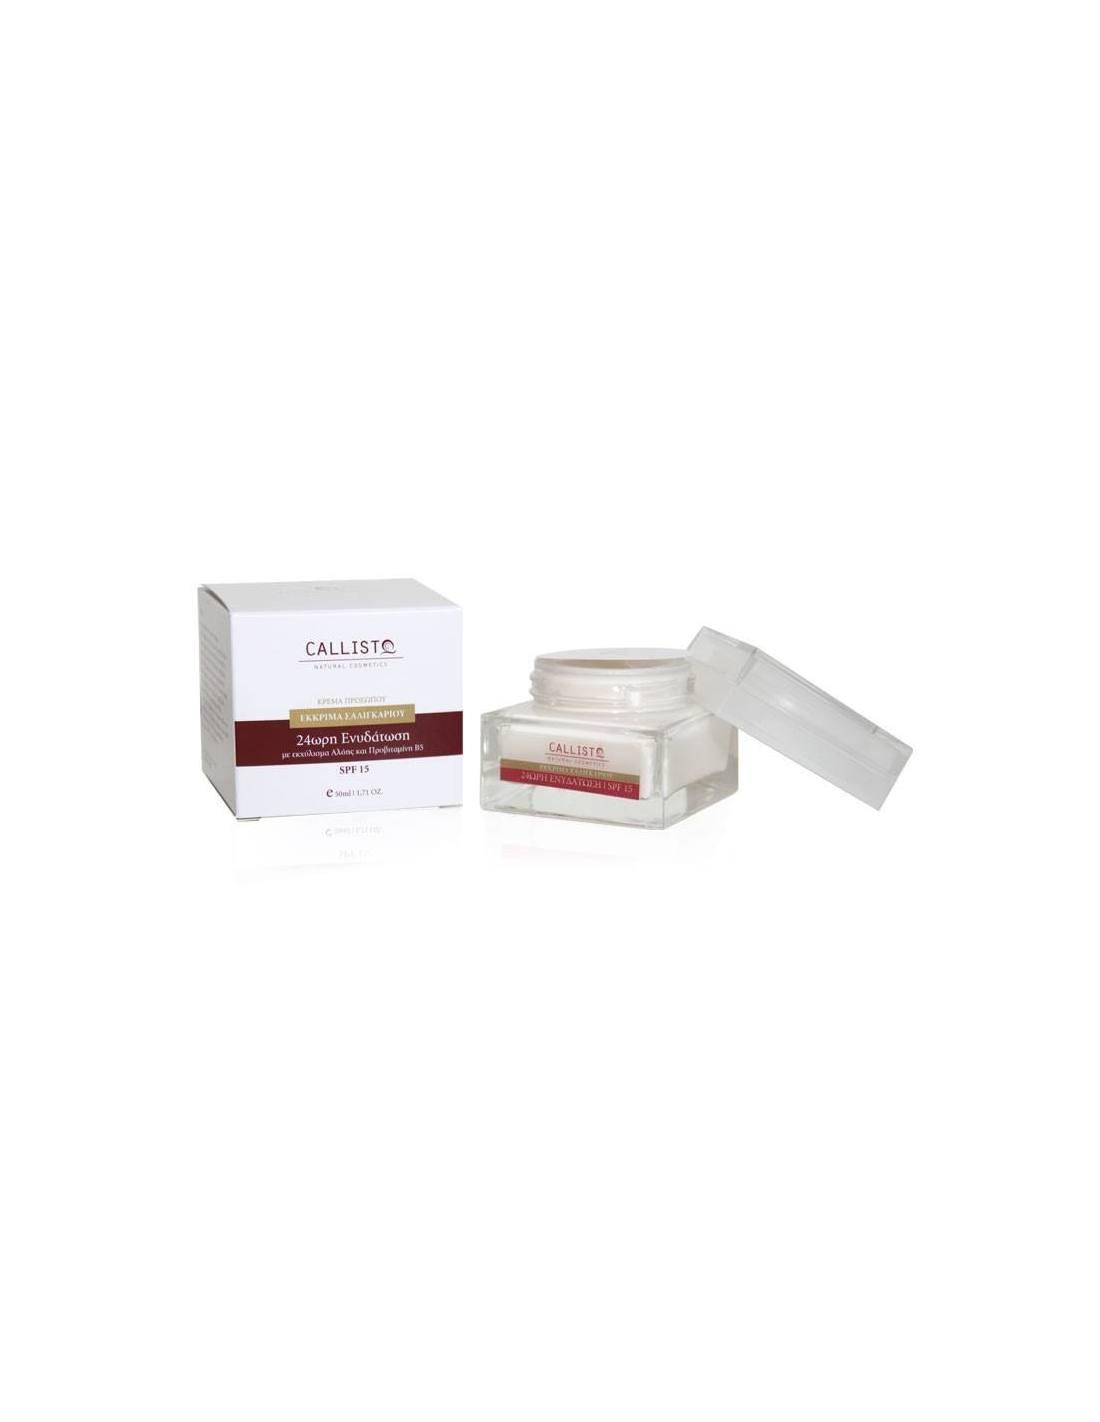 Callisto 24h Moisturizing Cream With Snail Spf15 50ml Secretion Filtrate Moisture Facial 30 Ml Tap To Zoom